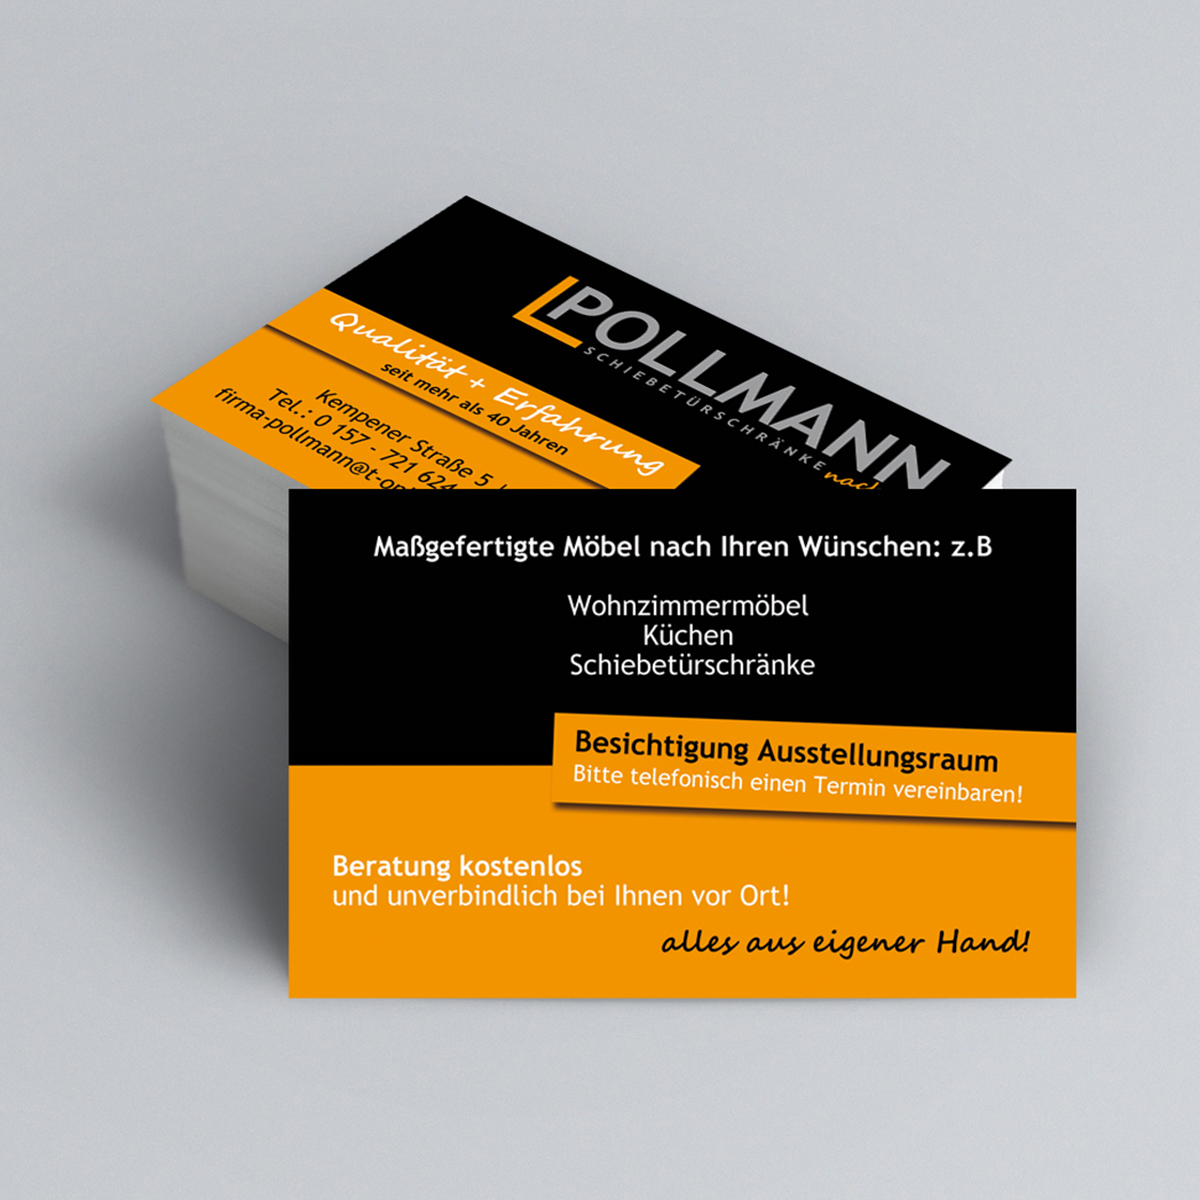 Europlant Canders Marketing Projekt Pollmann